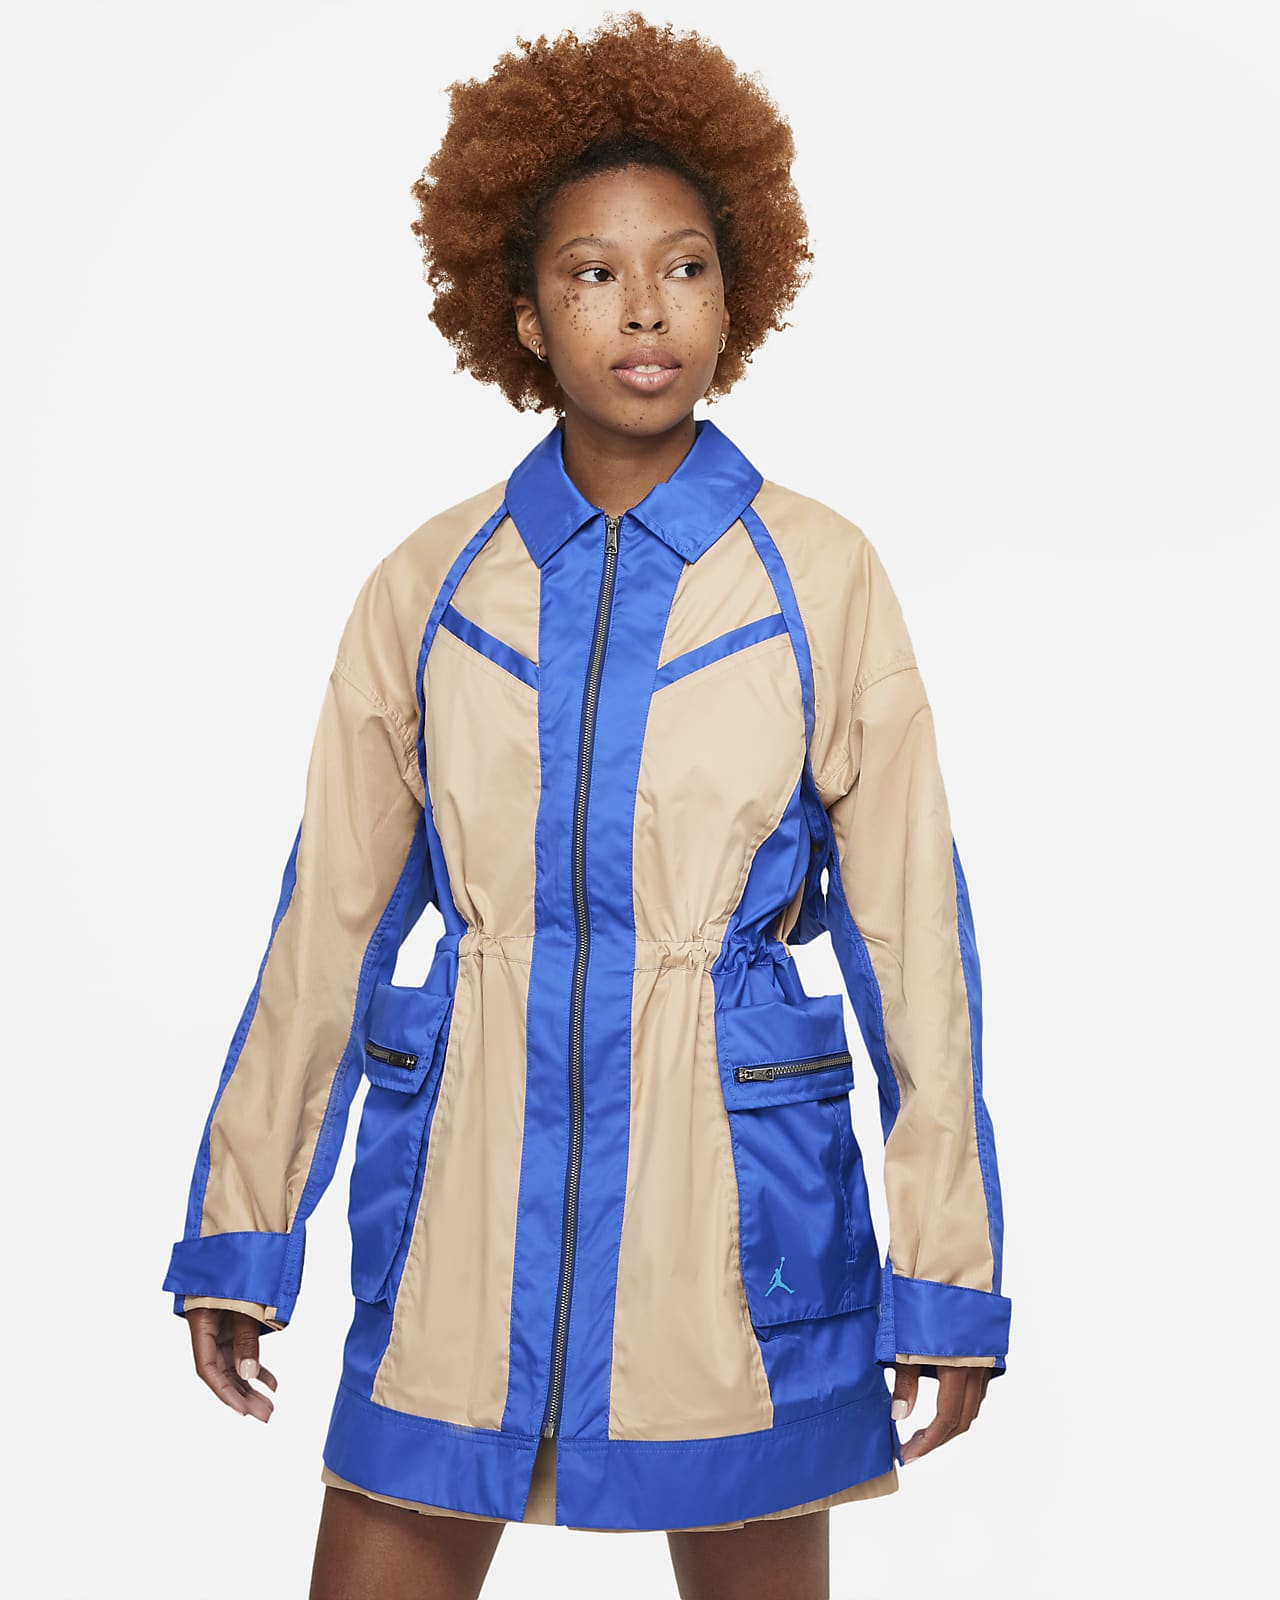 Jordan Next Utility Capsule Women's Jacket